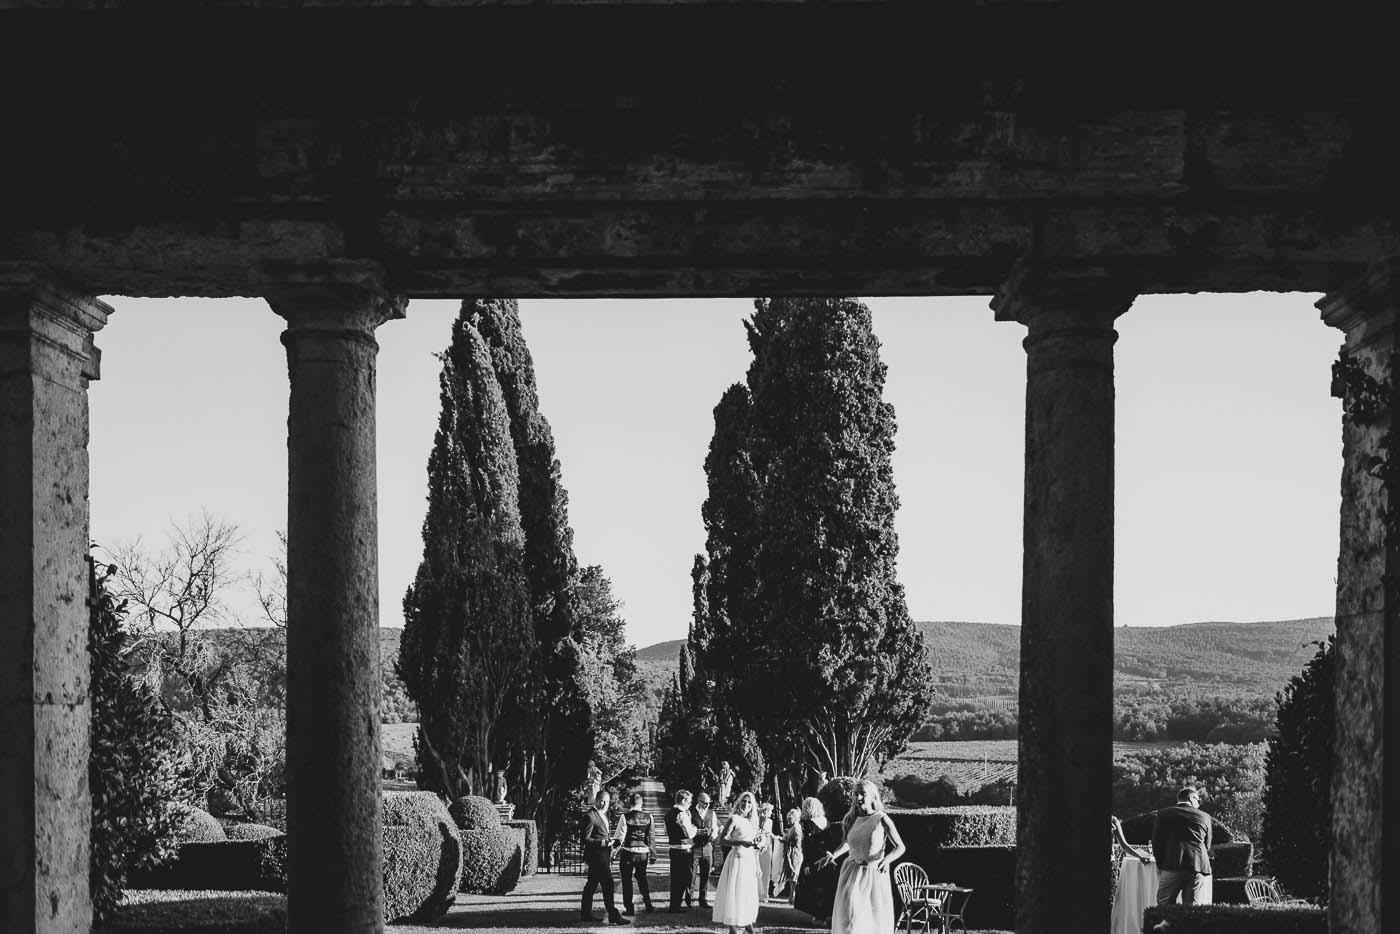 Relaxed-wedding-borgo-stomennano-1146